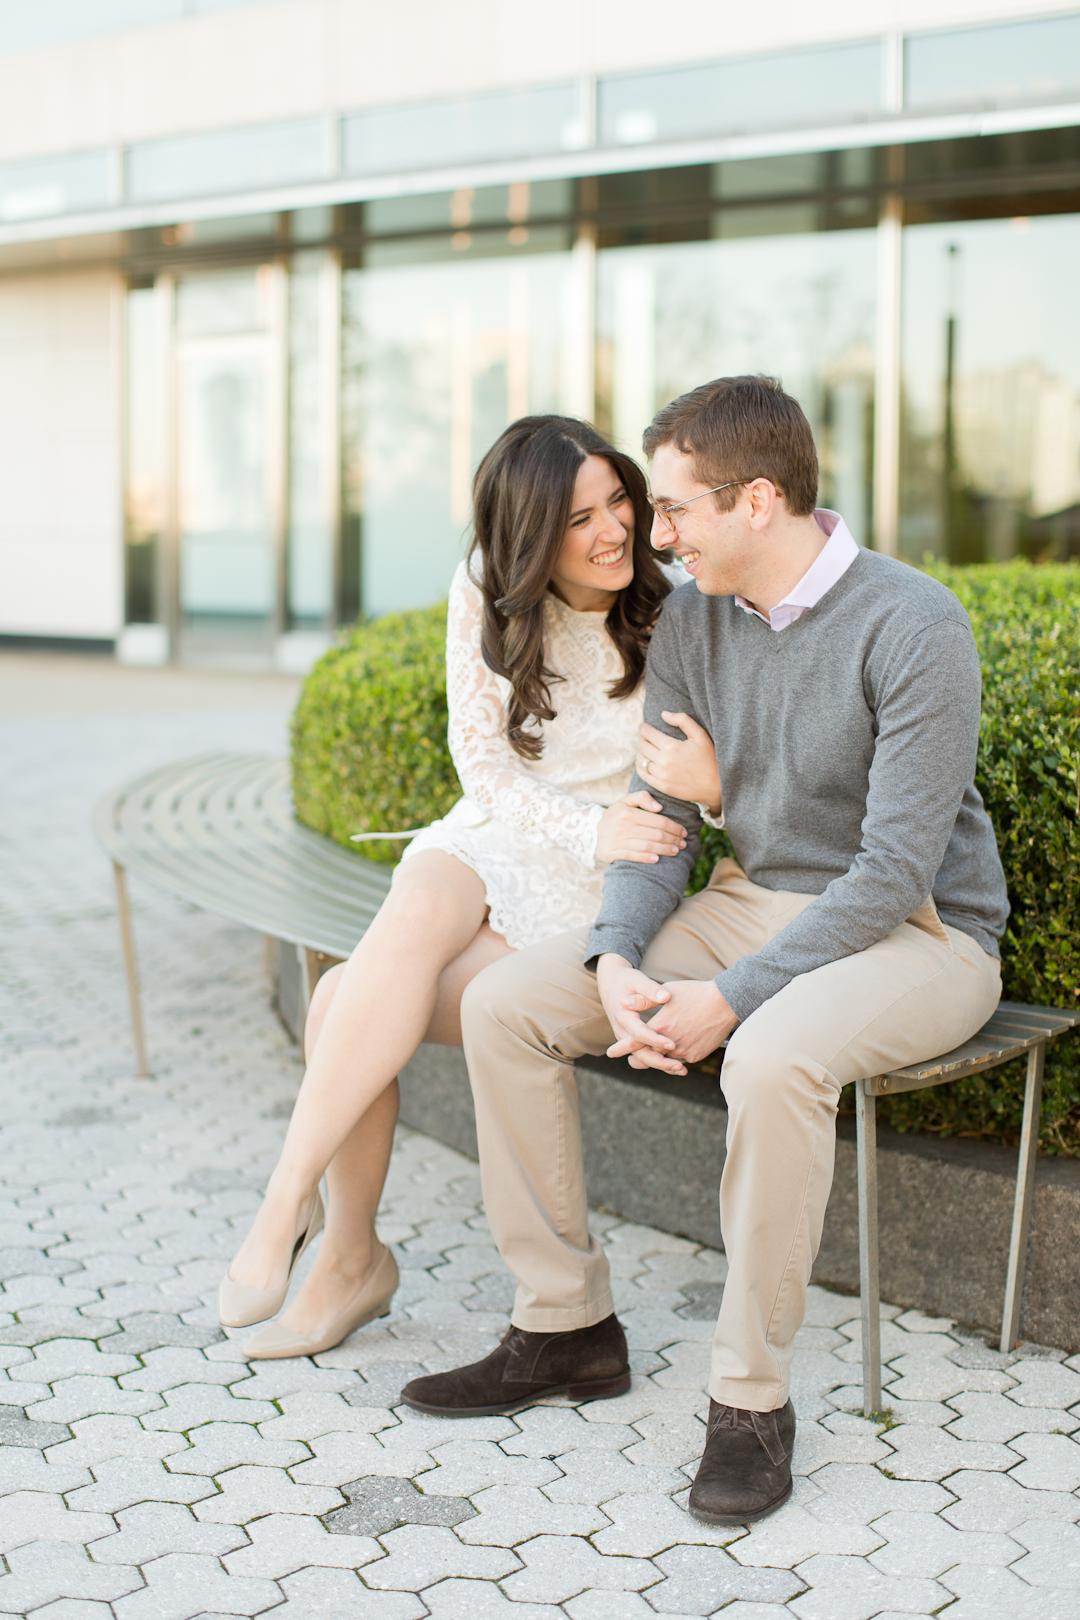 Melissa Kruse Photography - Christina & Alex Kips Bay Engagement Photos-38.jpg